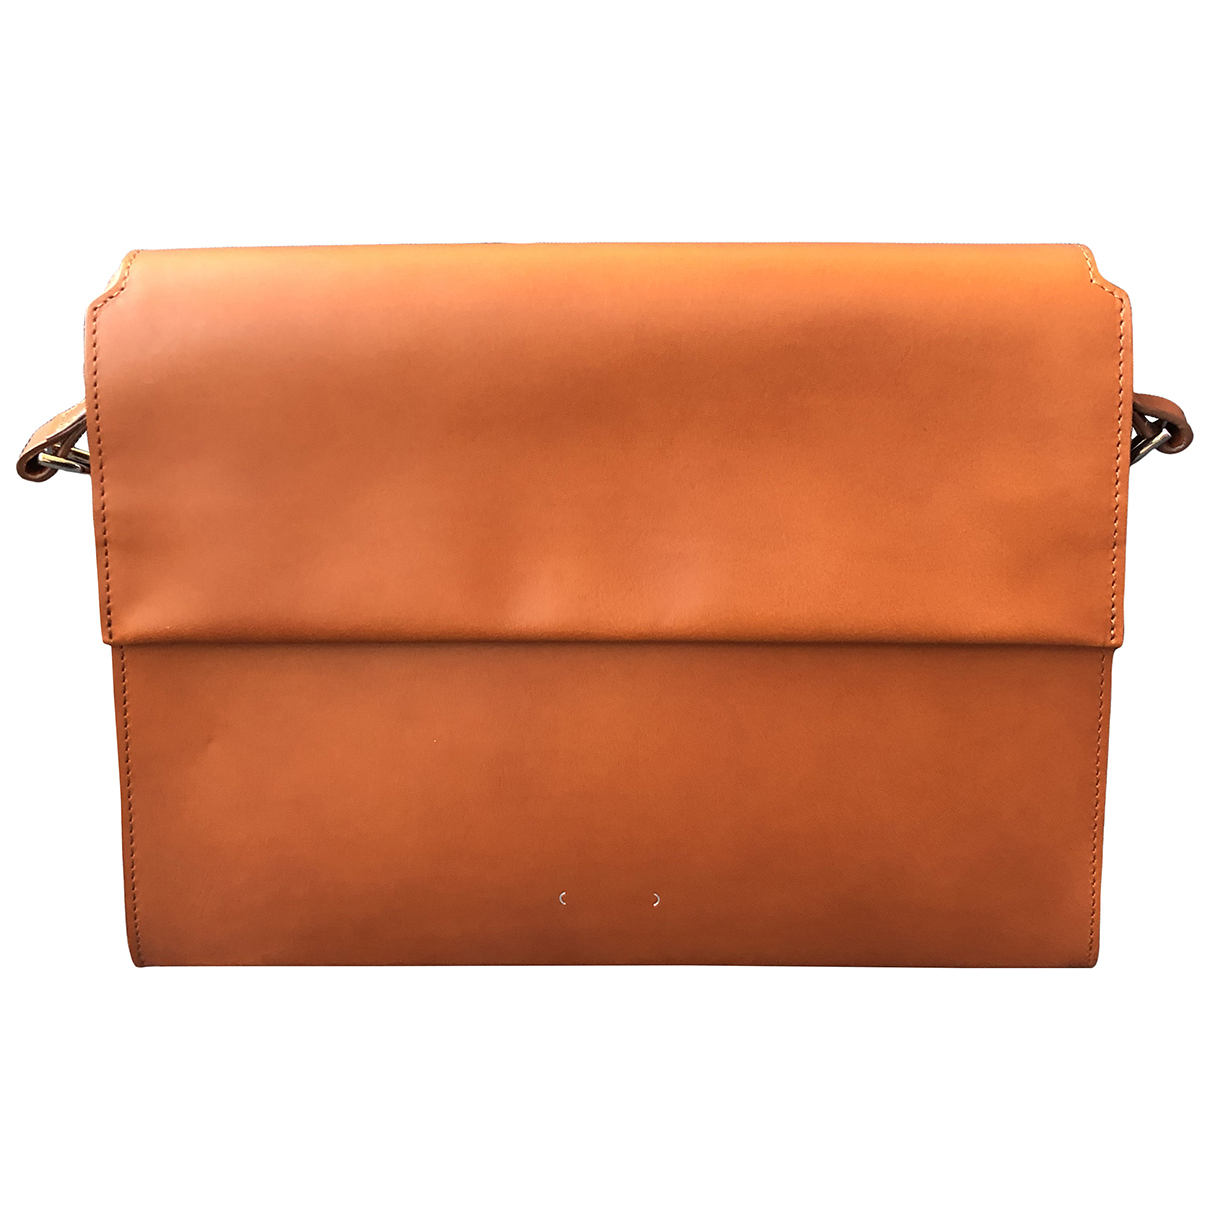 Pb 0110 \N Camel Leather handbag for Women \N